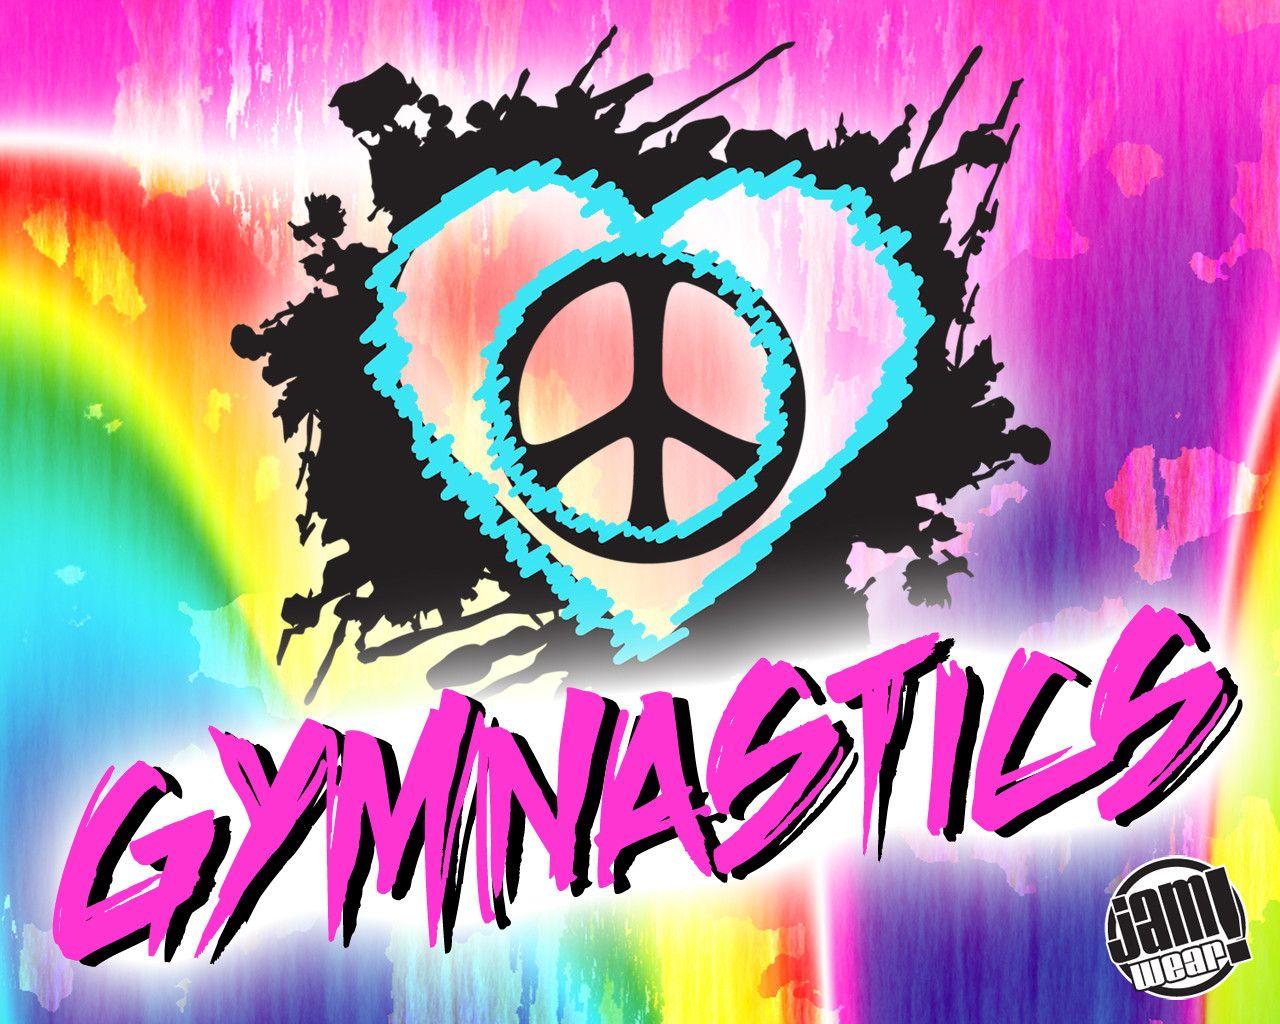 Gymnastics Wallpaper Gymnastics Wallpaper Softball Backgrounds Text Art